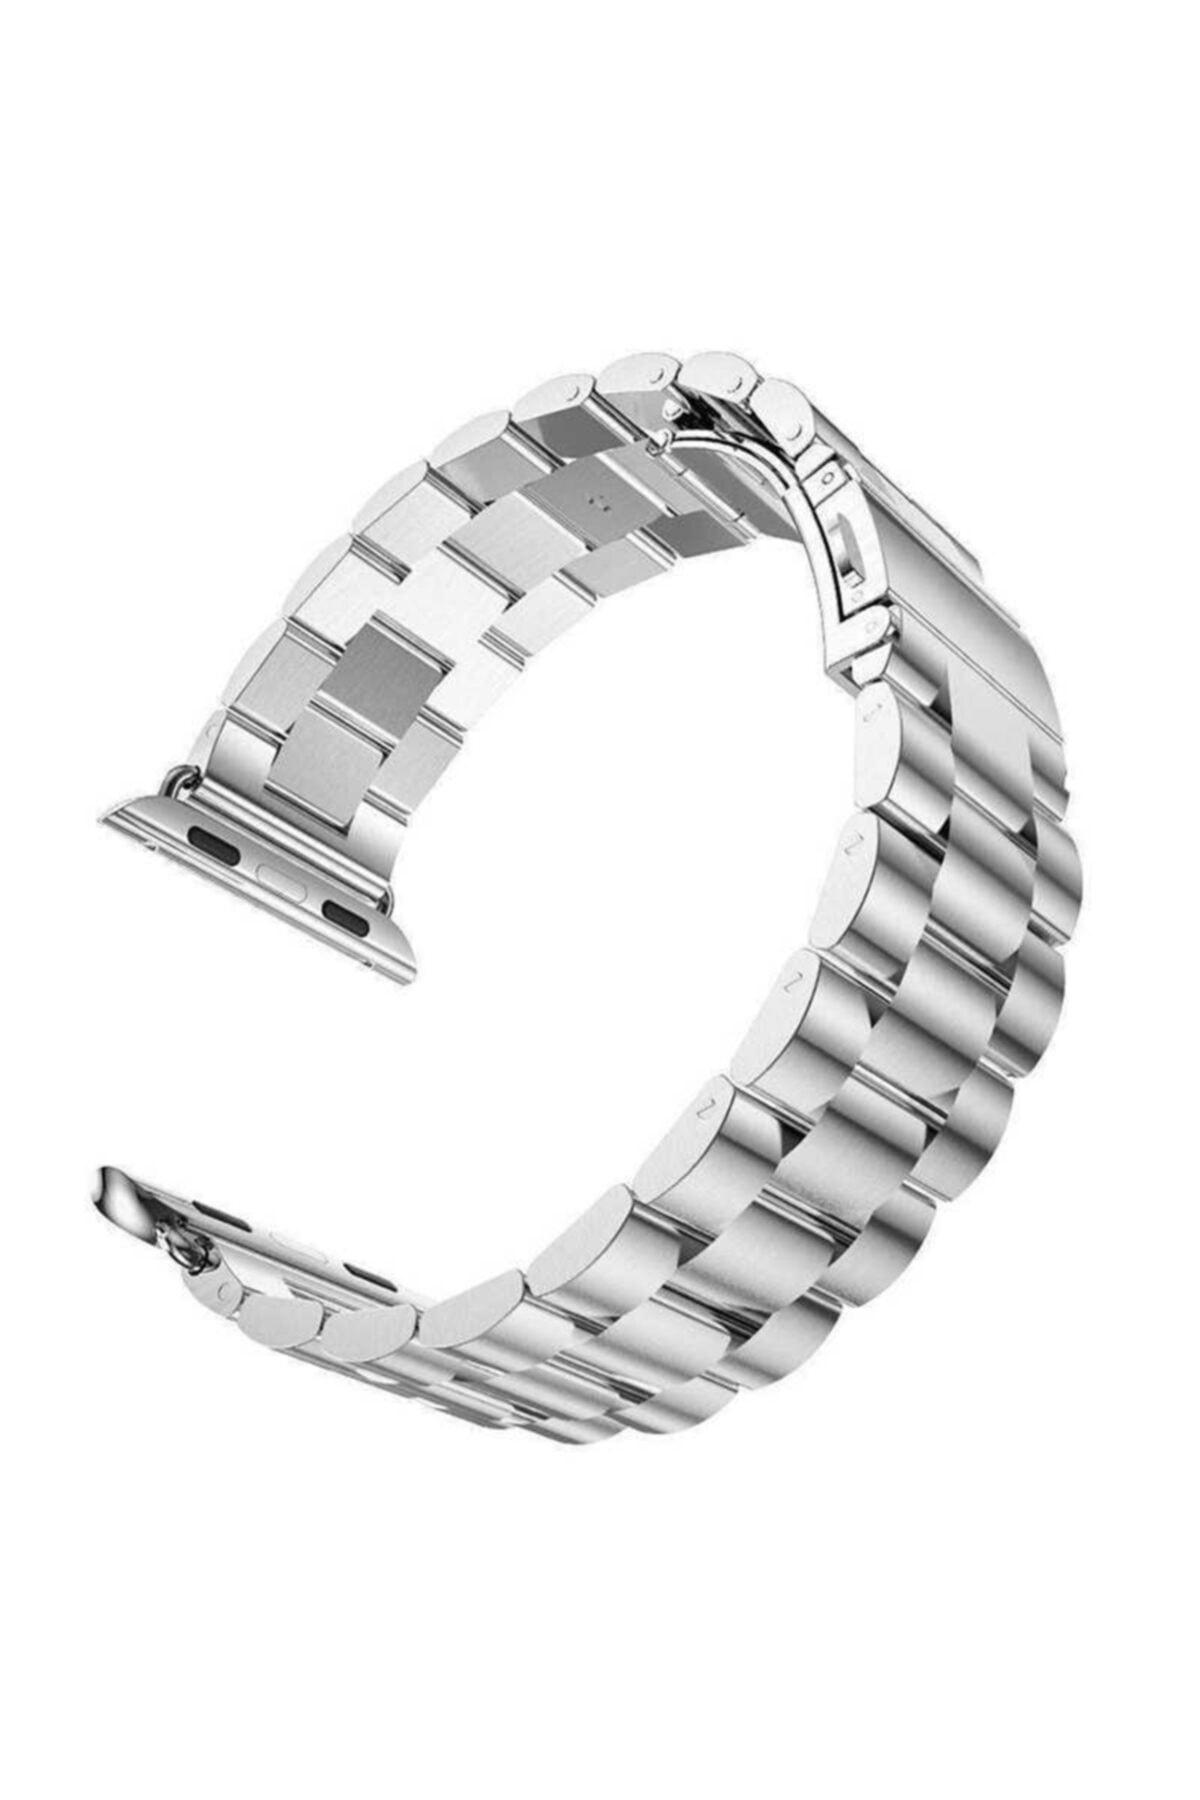 zore Apple Watch 1 2 3 4 5 6 Serisi 40mm Yandan Klipsli Ayarlanabilir Metal Kordon (krd-04) 2